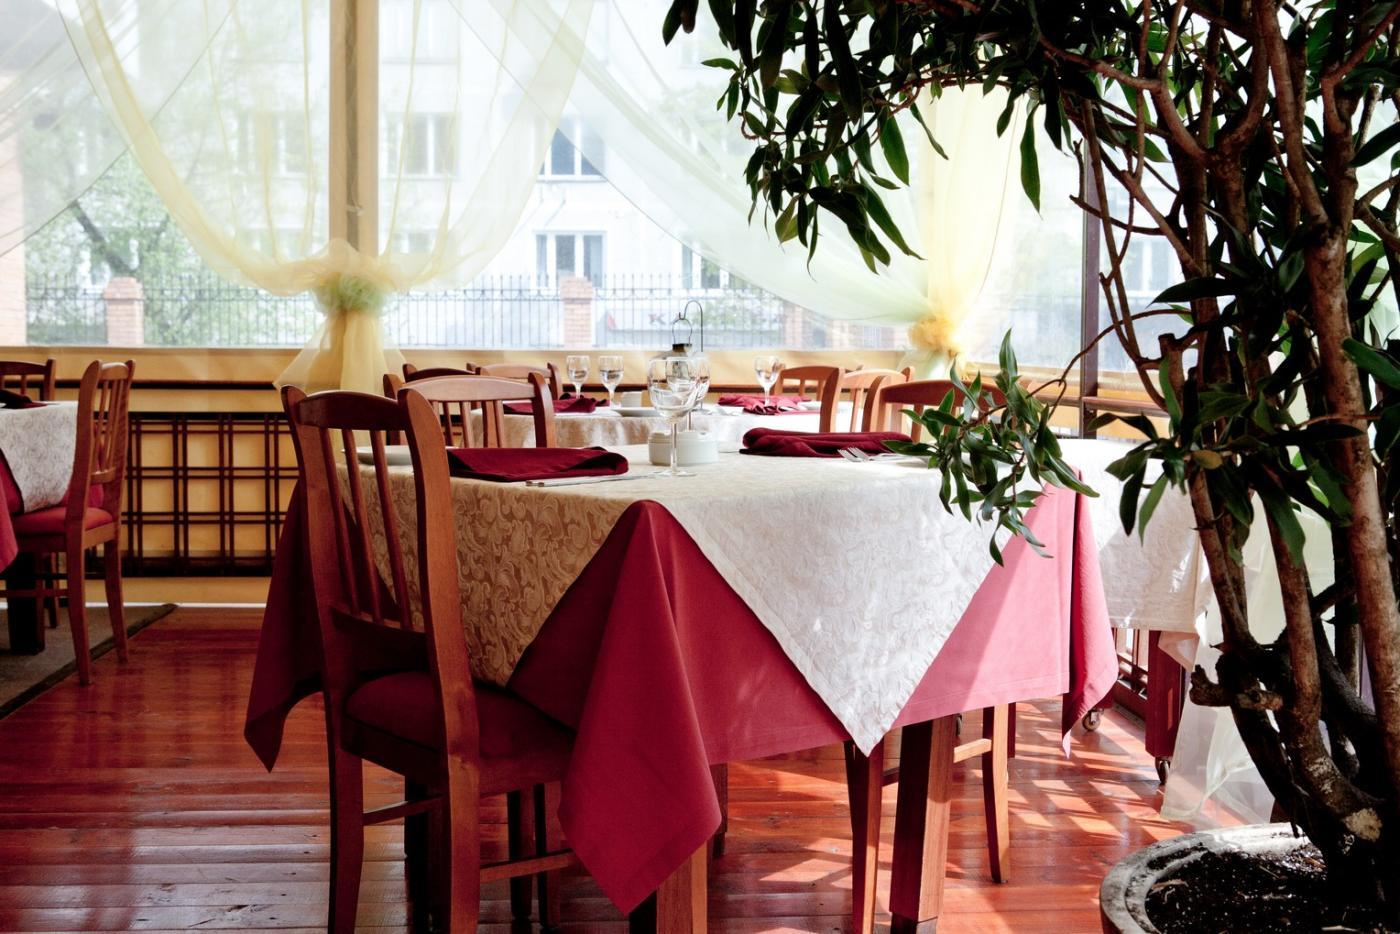 Итальянский Ресторан Чикко Клуб на Азовской (Cicco club) фото 1